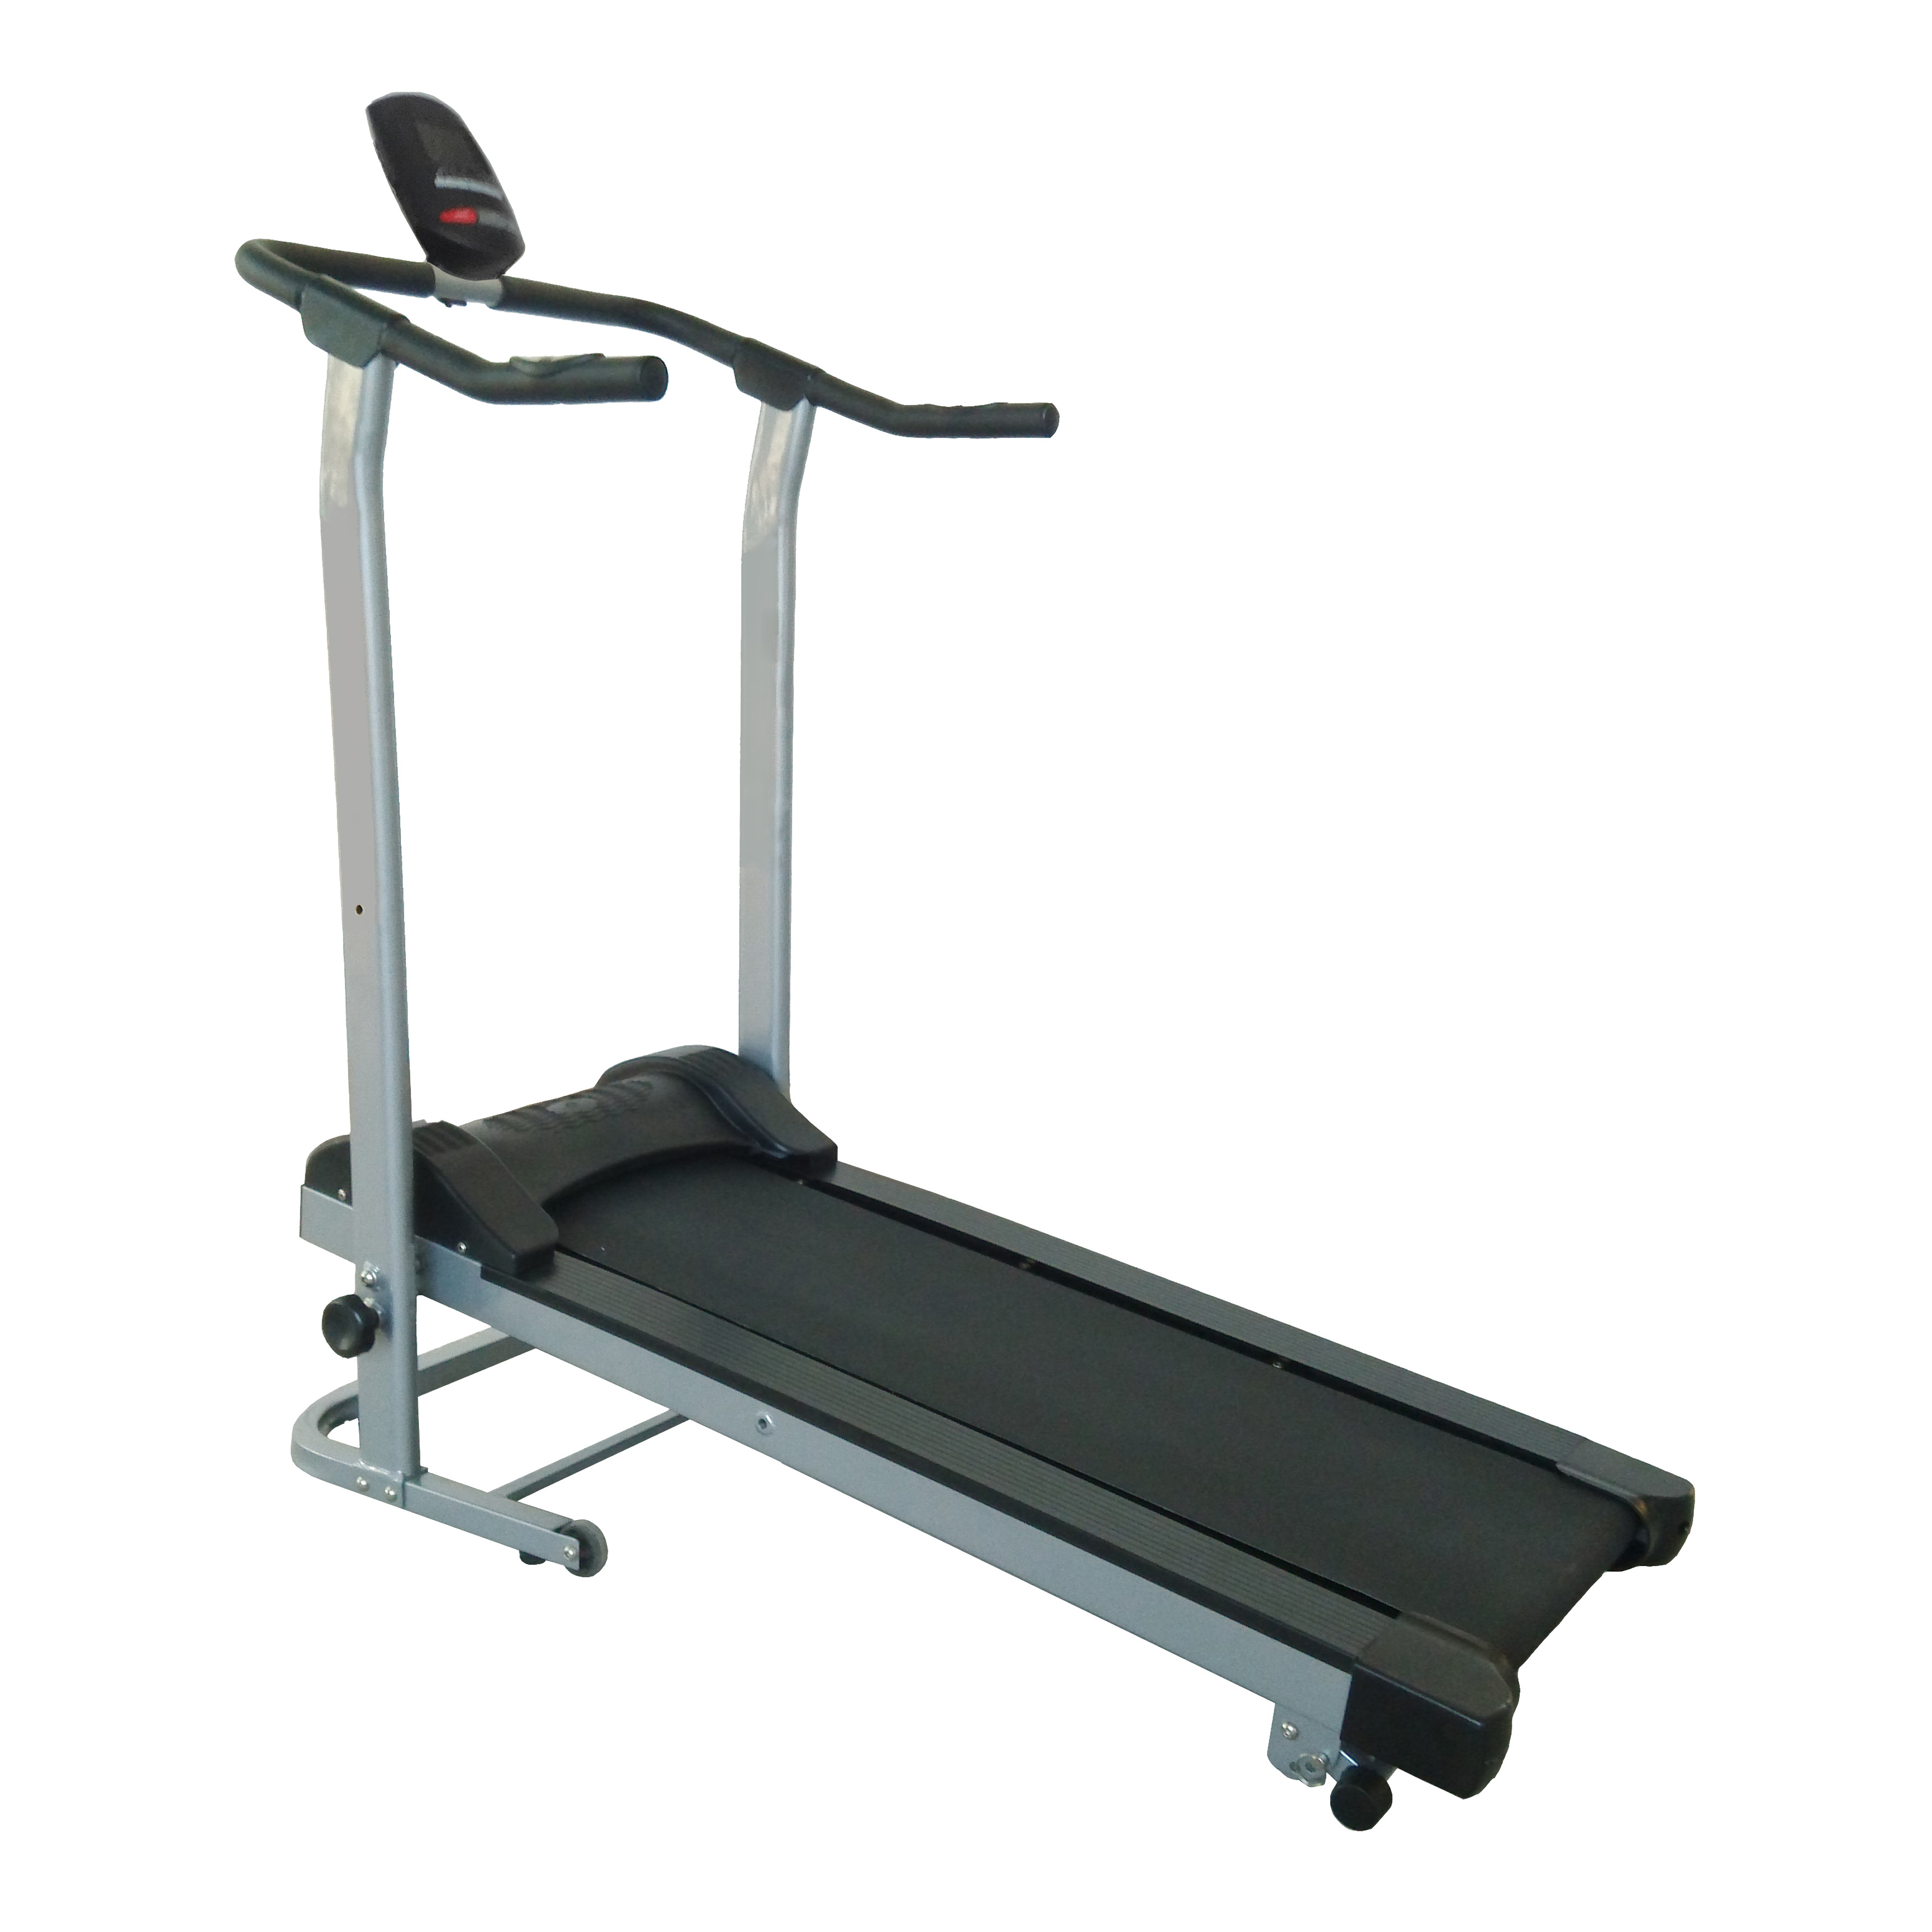 Electric Treadmill Desk: Sunny Health & Fitness SF-T1408M Manual Walking Treadmill